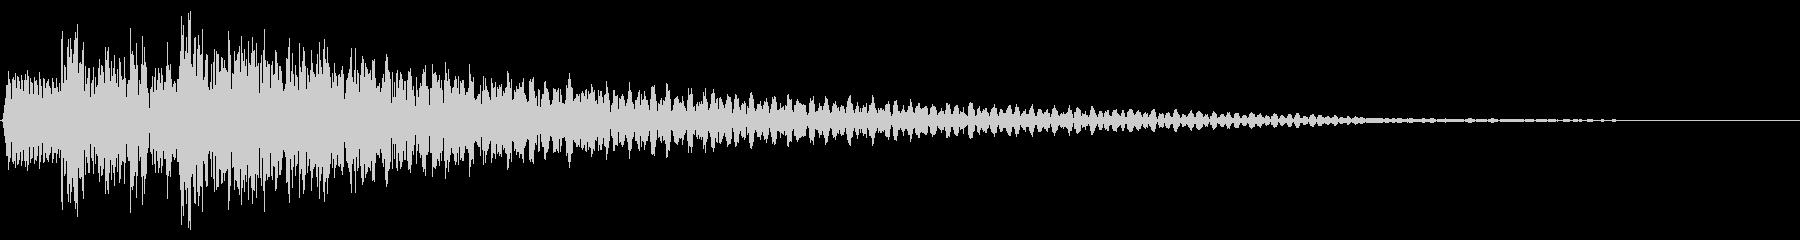 Restless arpeggio nylon guitar's unreproduced waveform